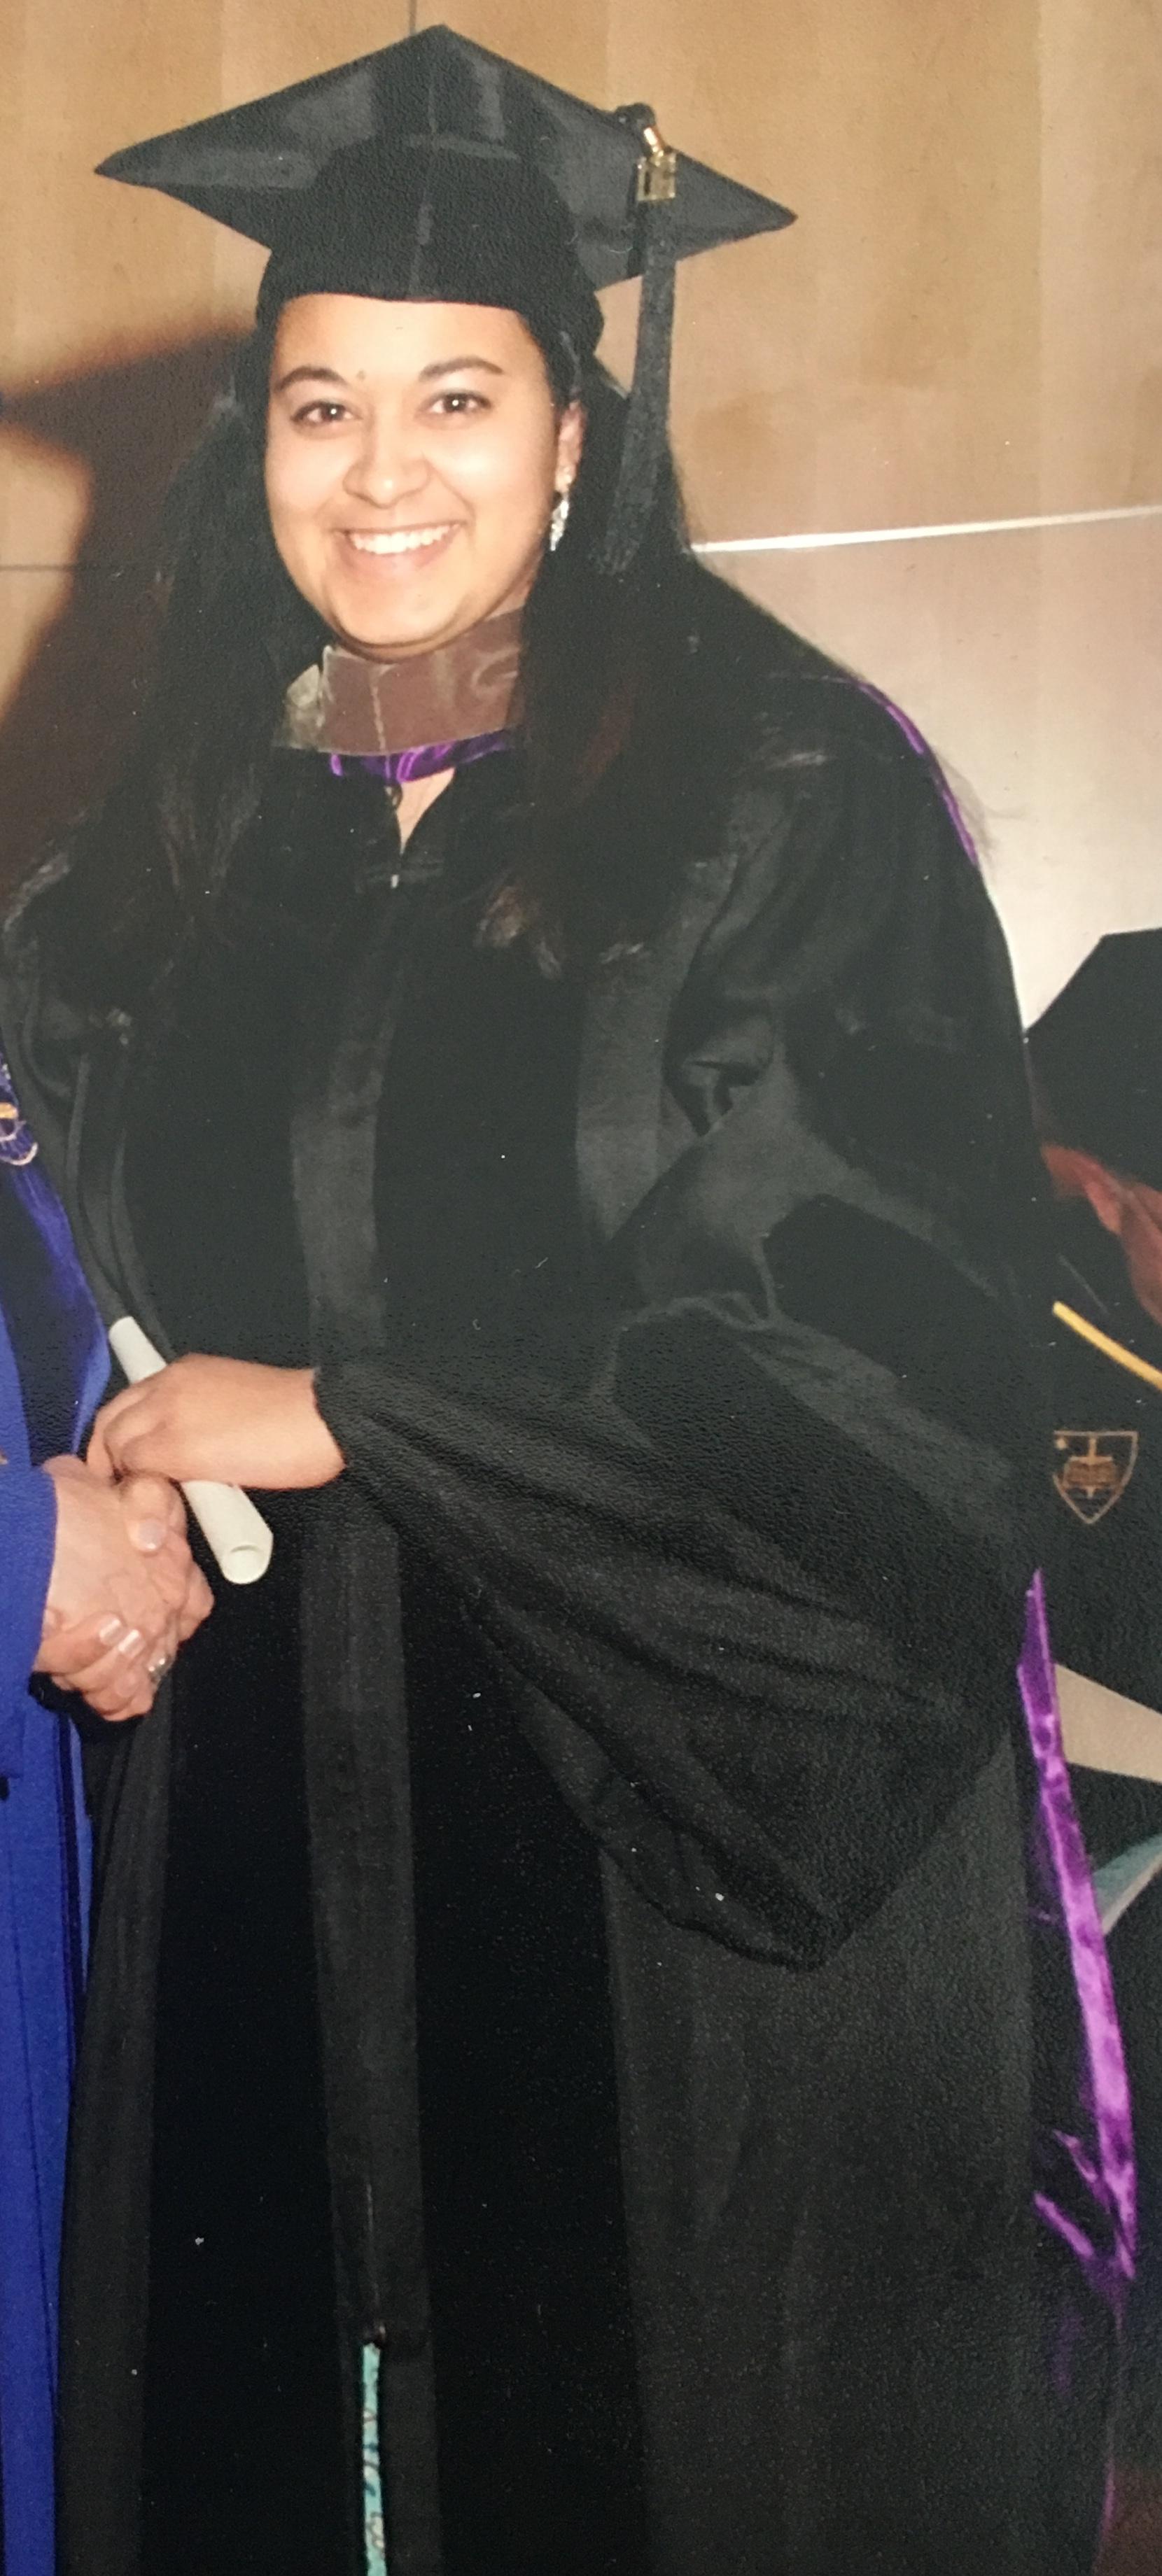 Graduating from Pharmacy school